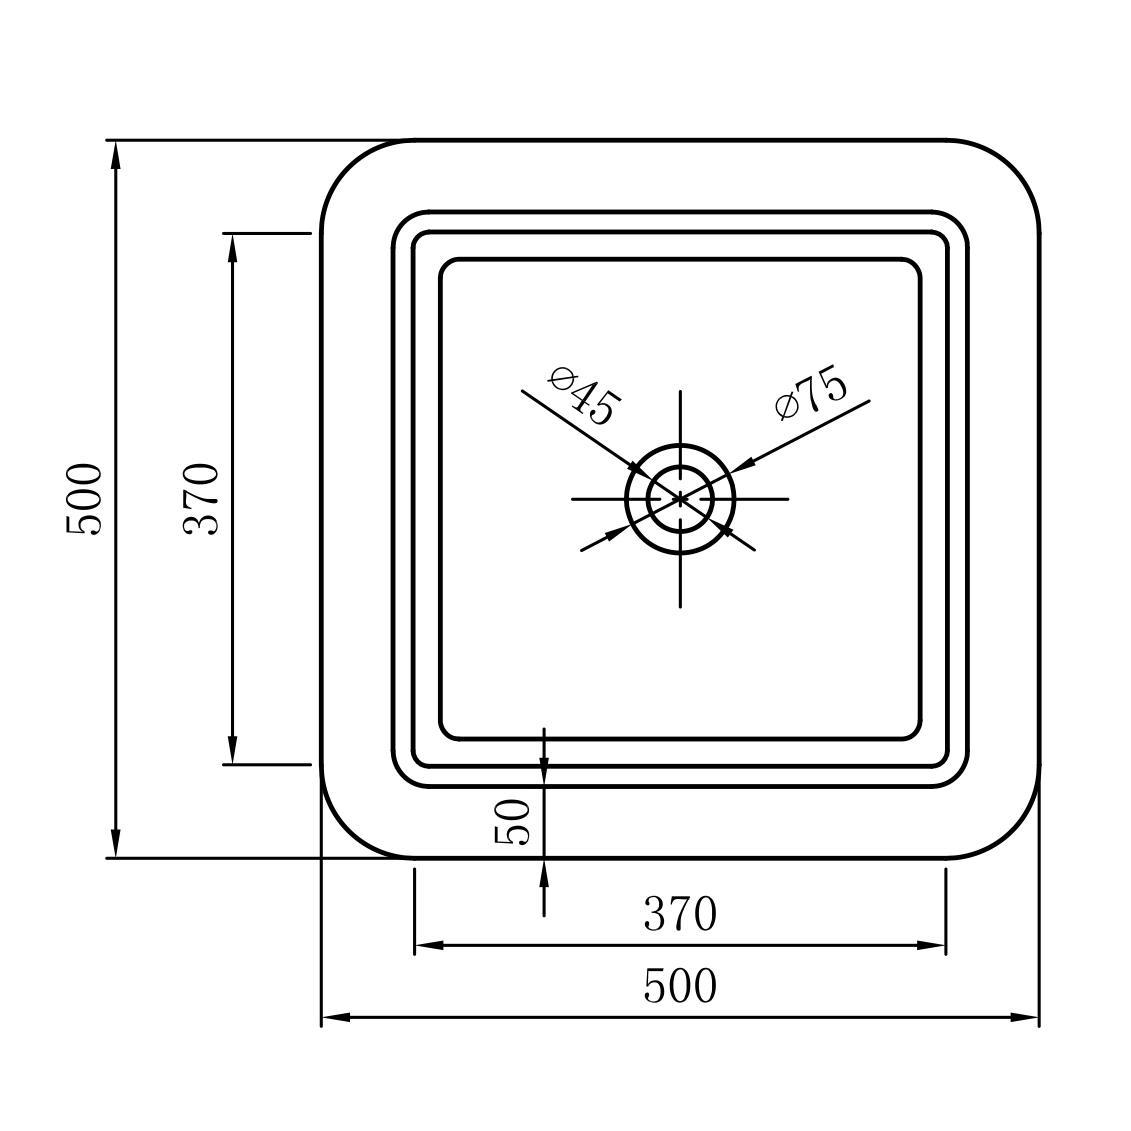 Freestanding washbasin BA31 - Drawing 2